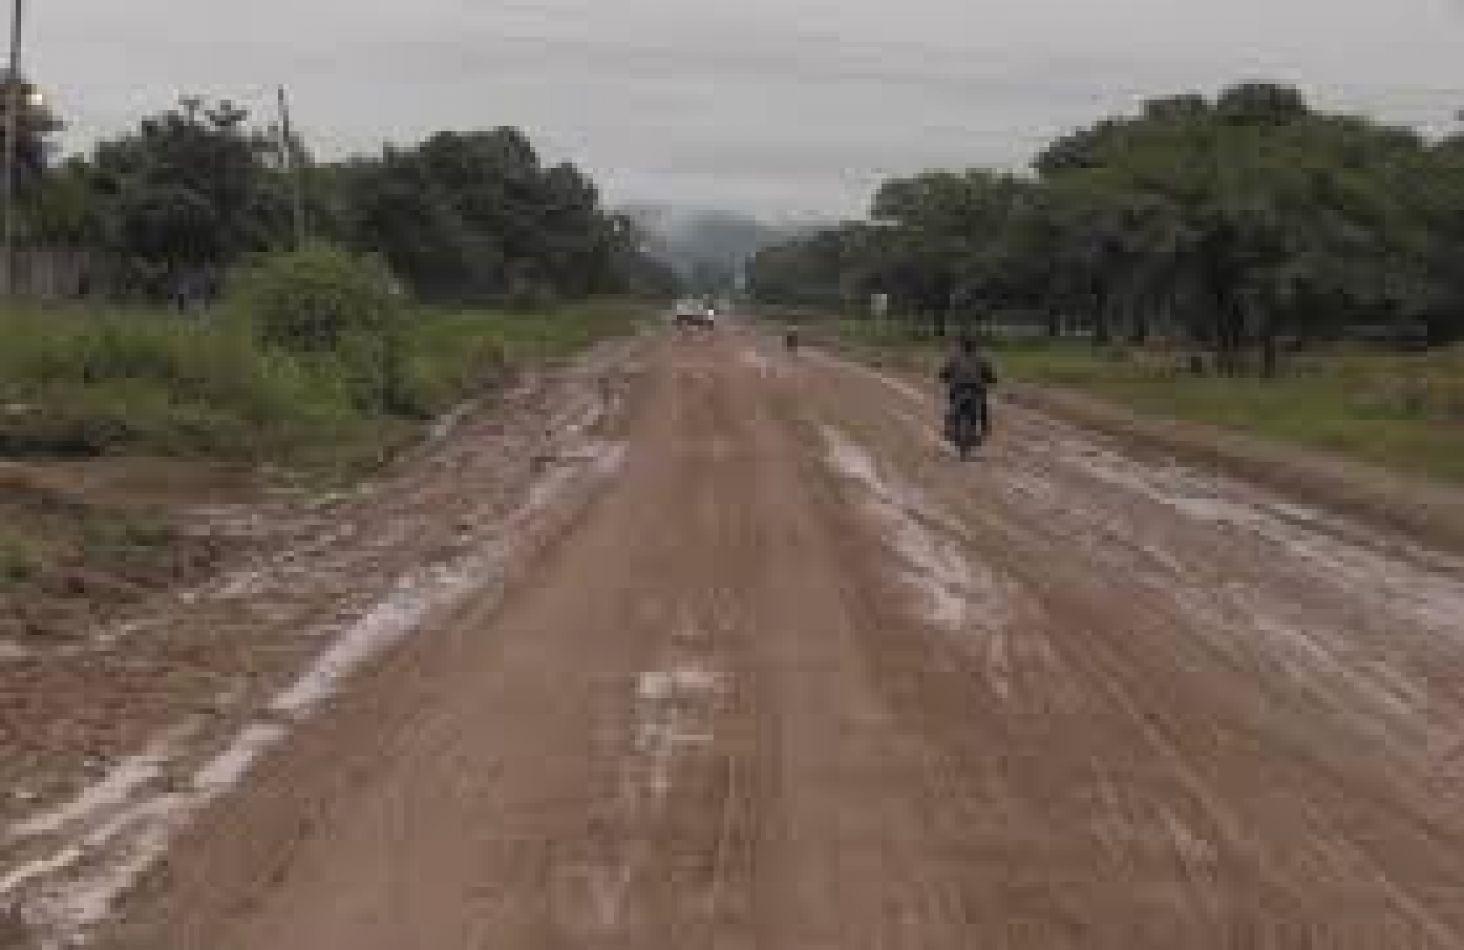 Ruta Nacional 86